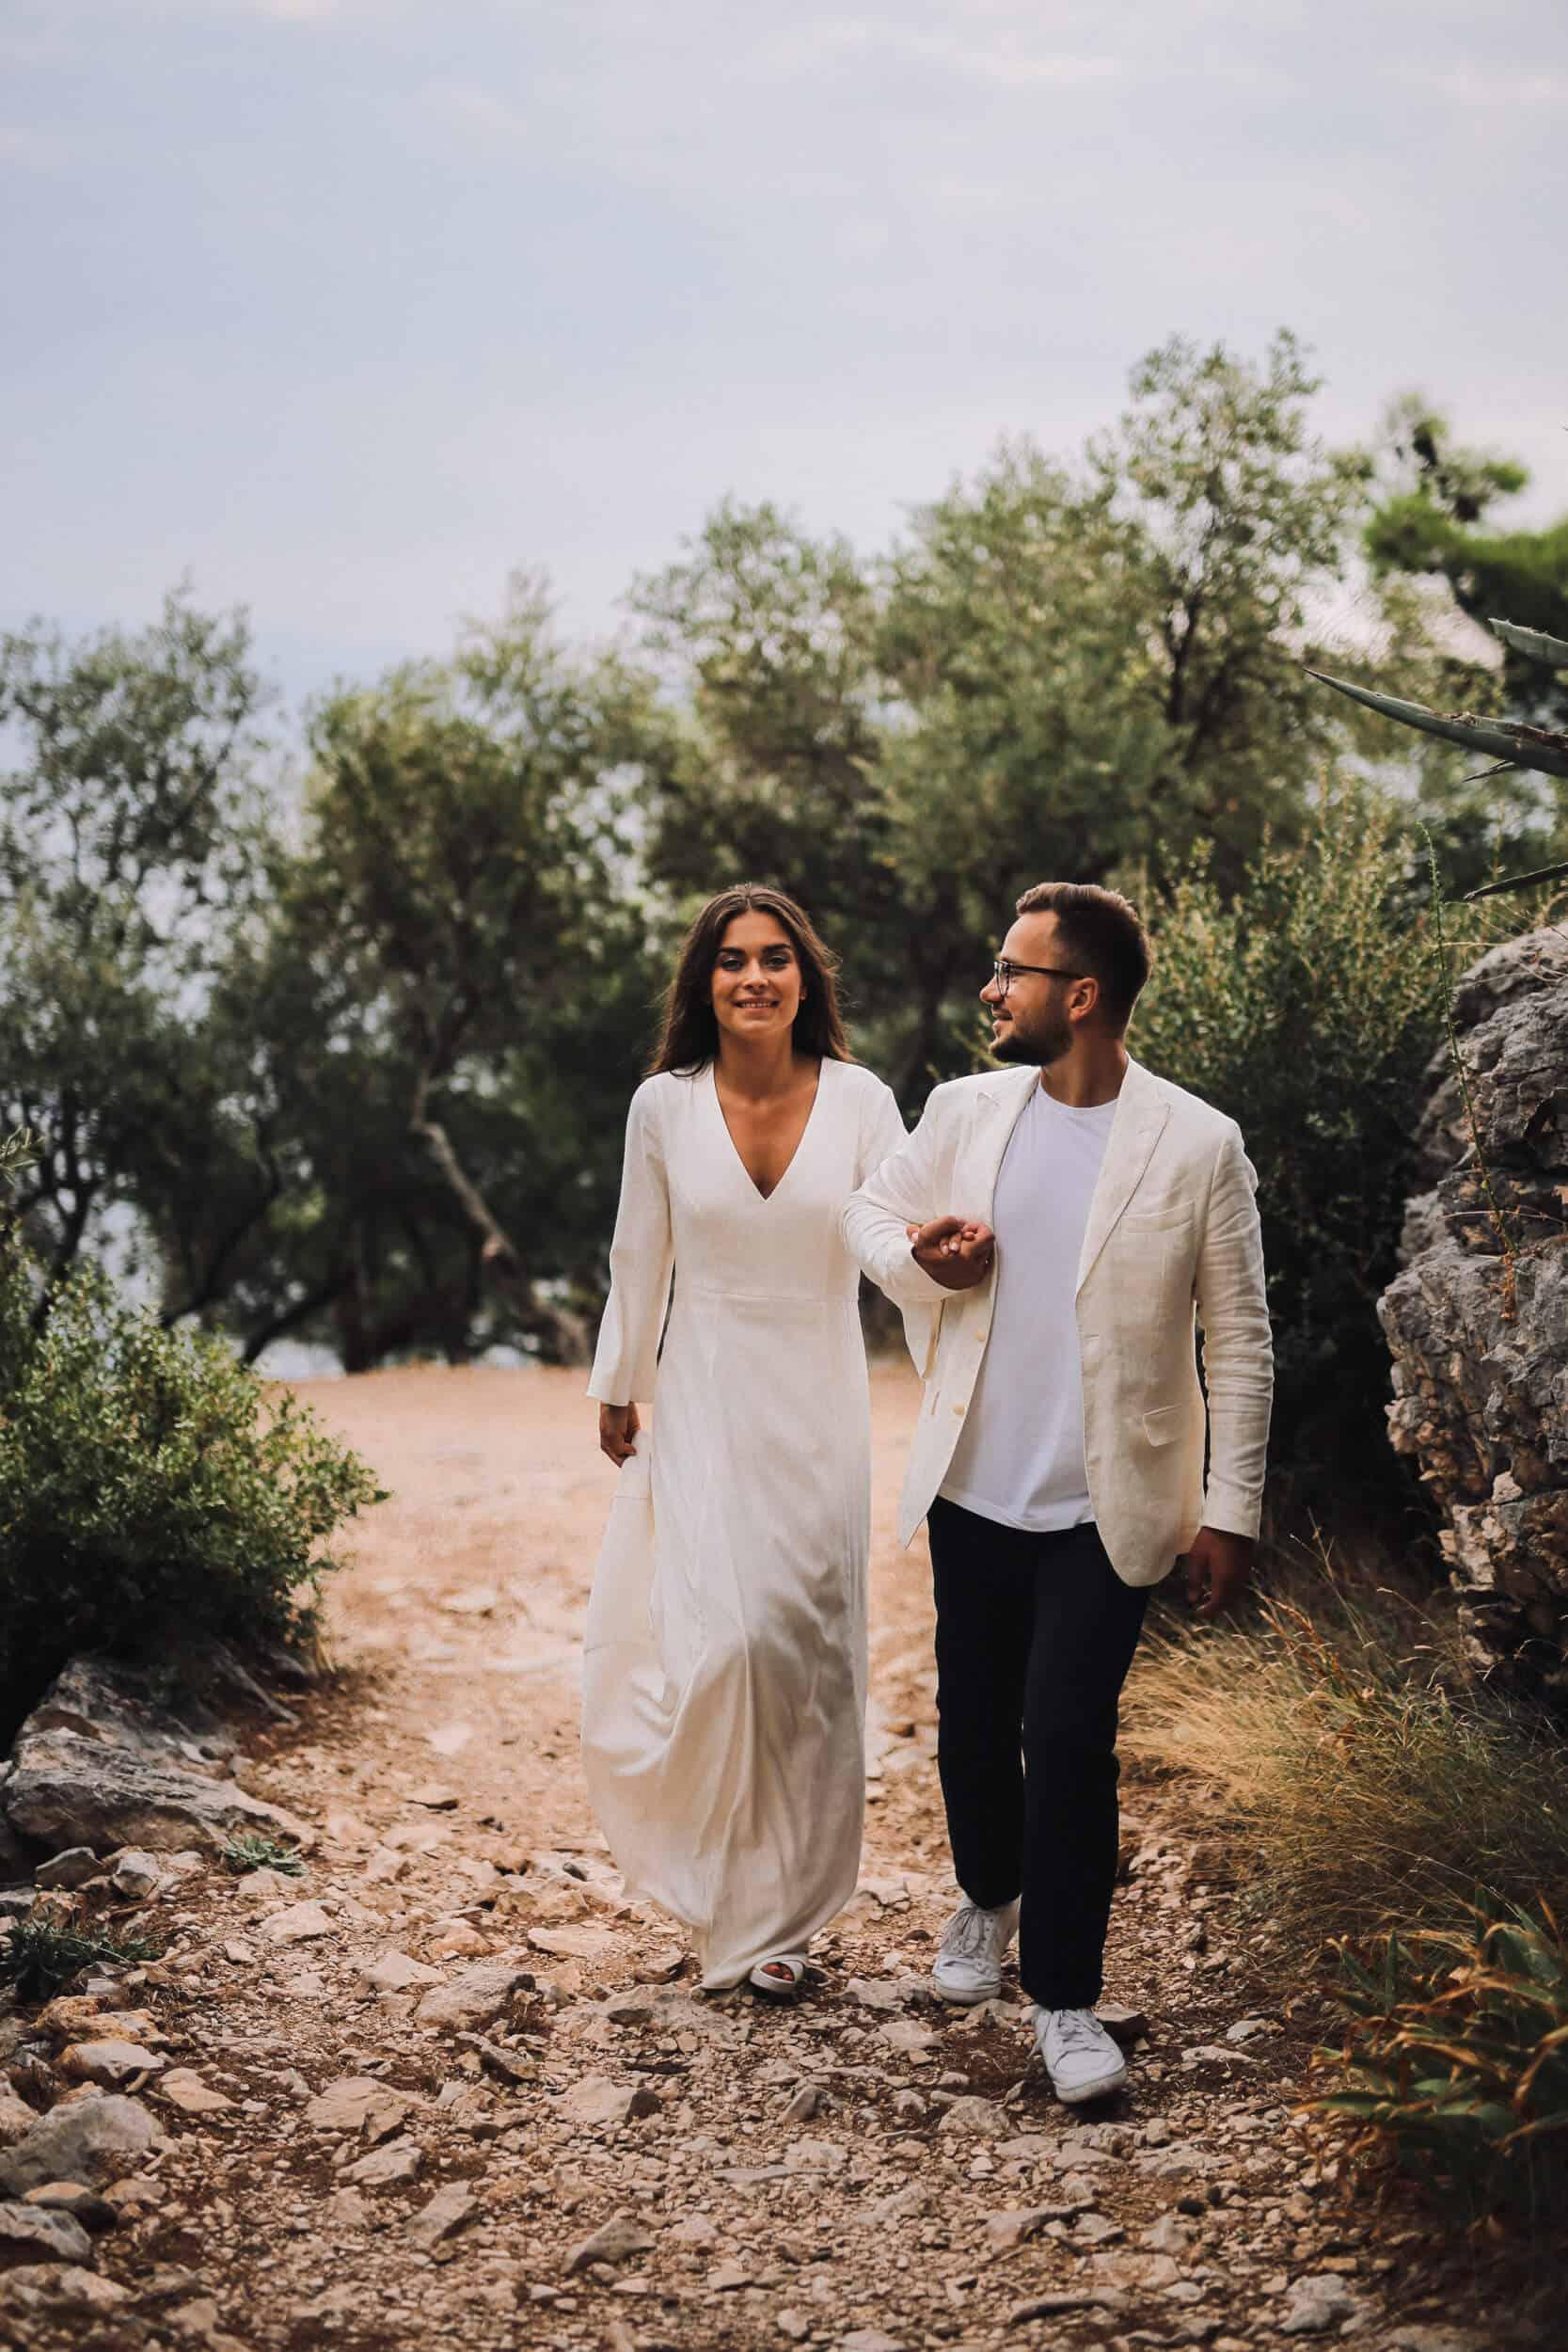 Croatia honeymoon ideas 009 | Croatia Elopement Photographer and Videographer